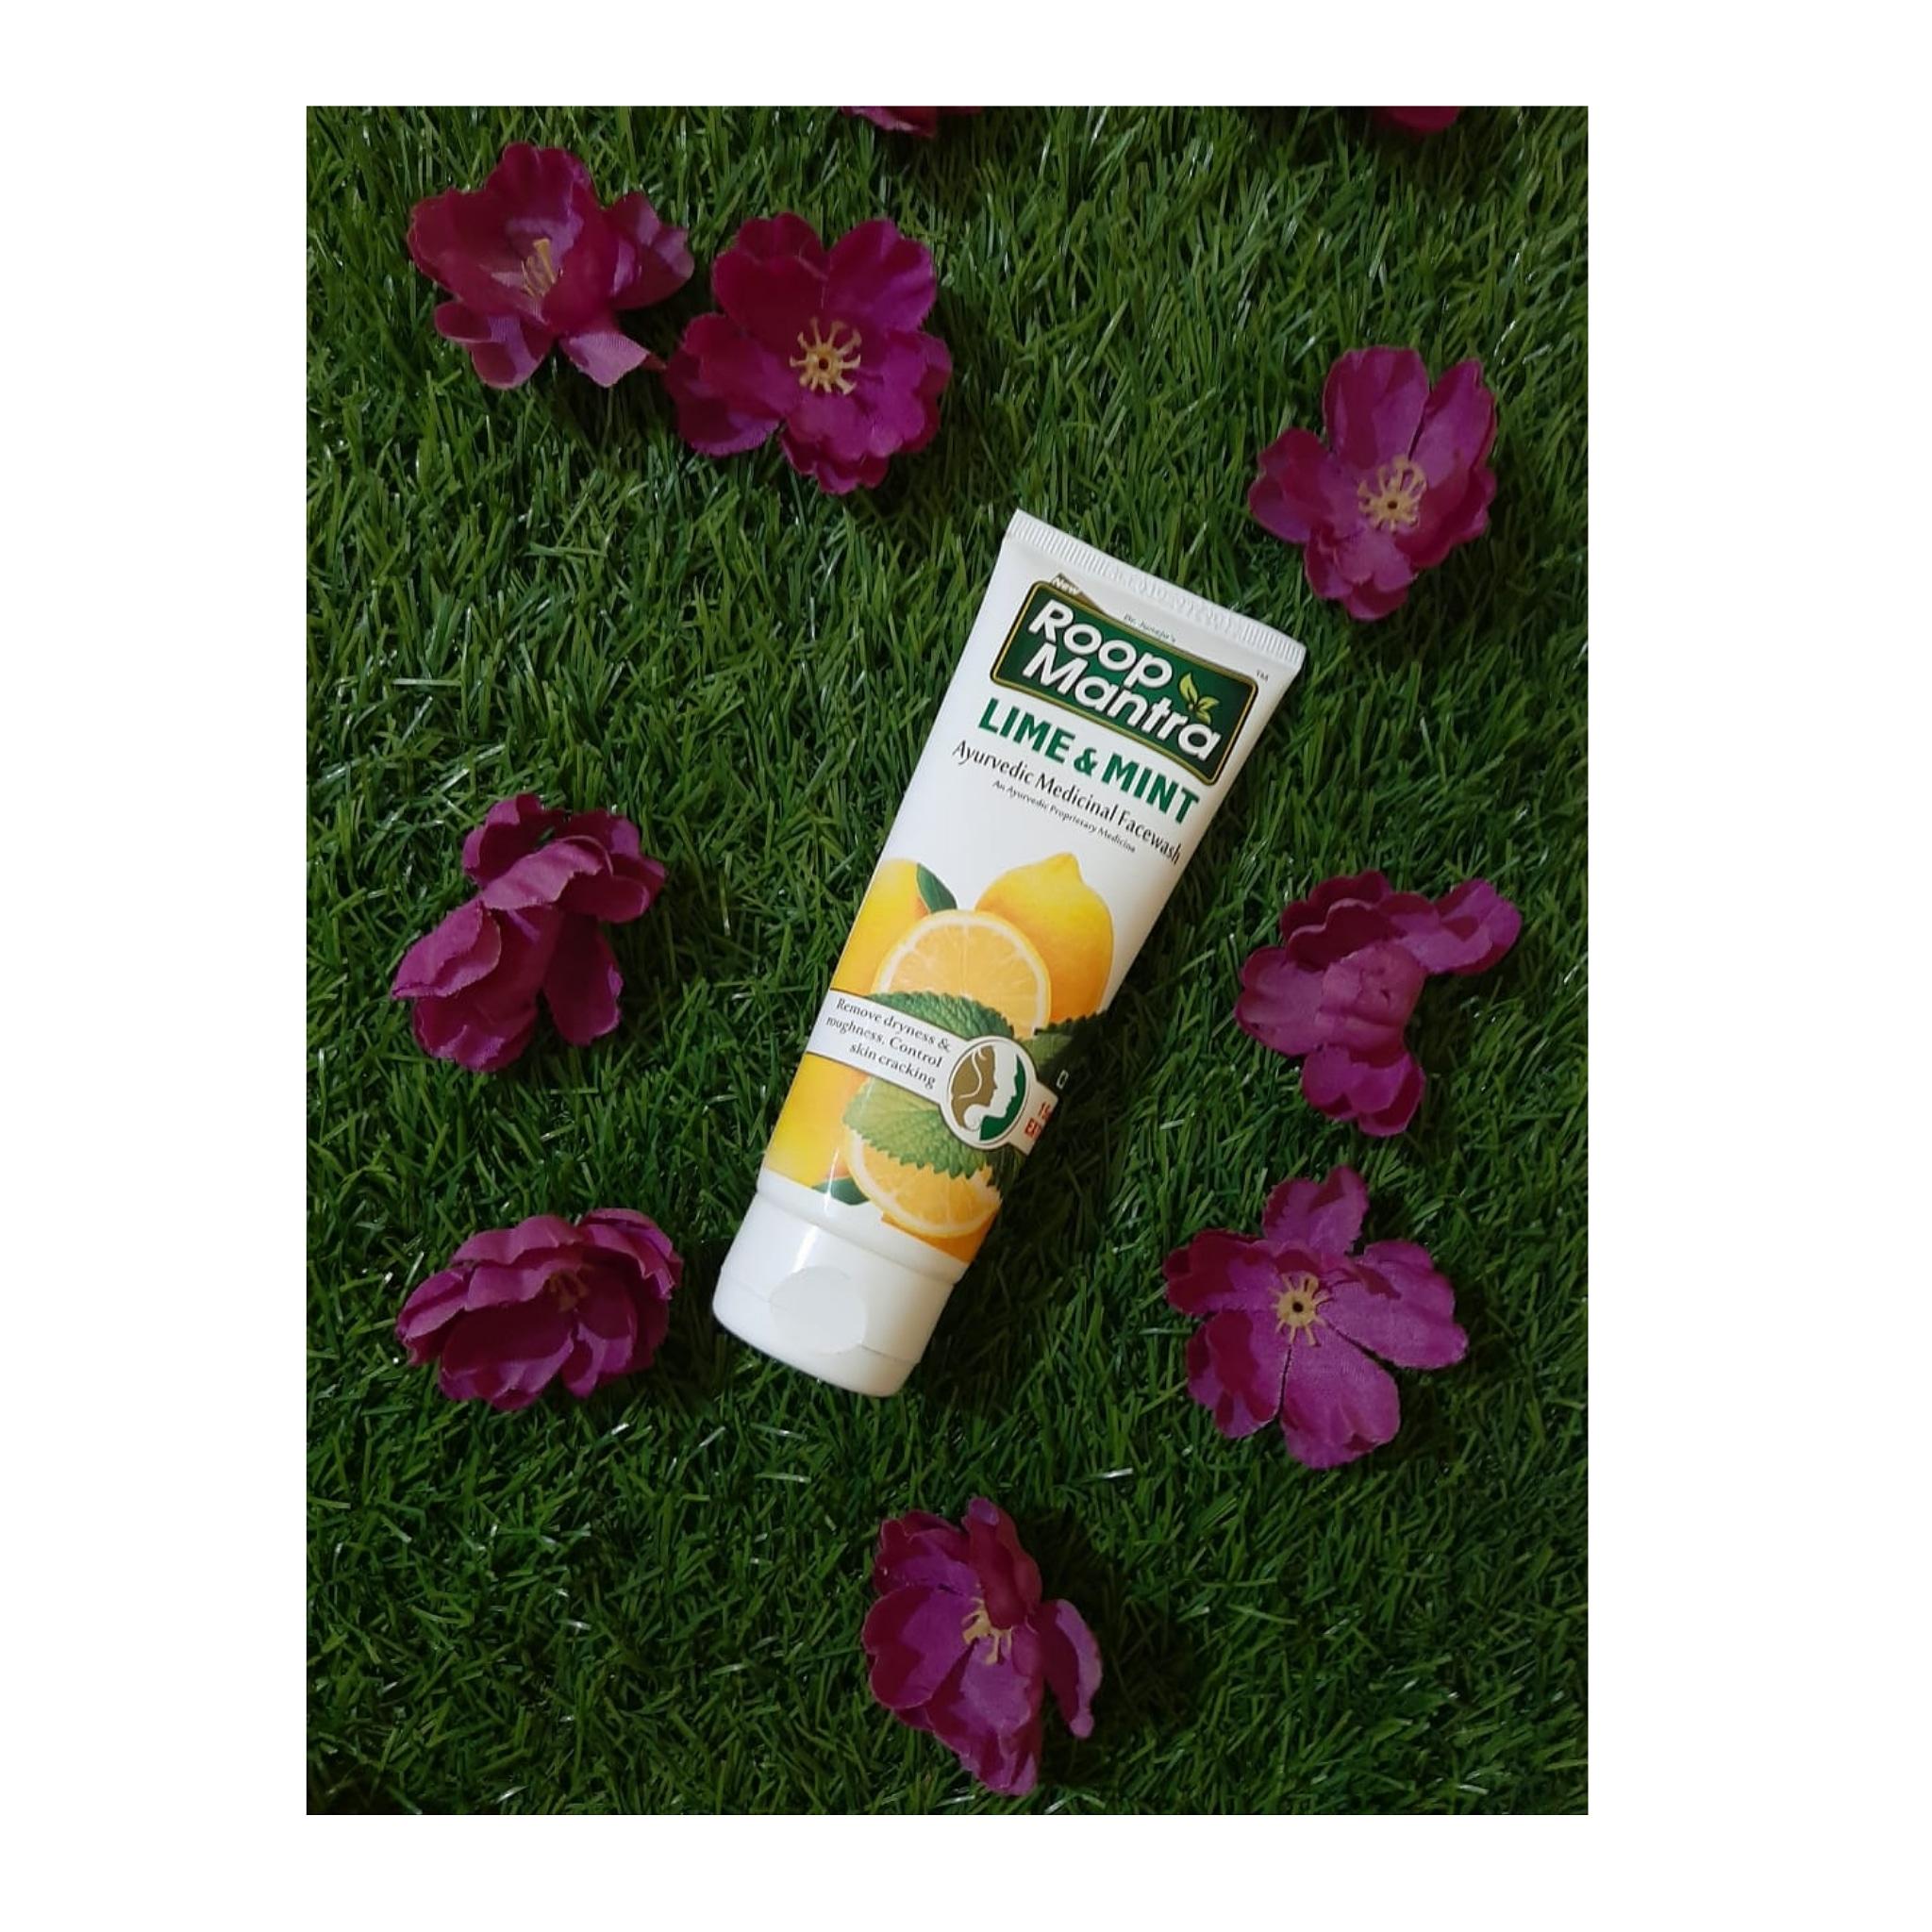 Roop Mantra Lime & Mint Face Wash-Refreshing face wash-By aprajita_thakur